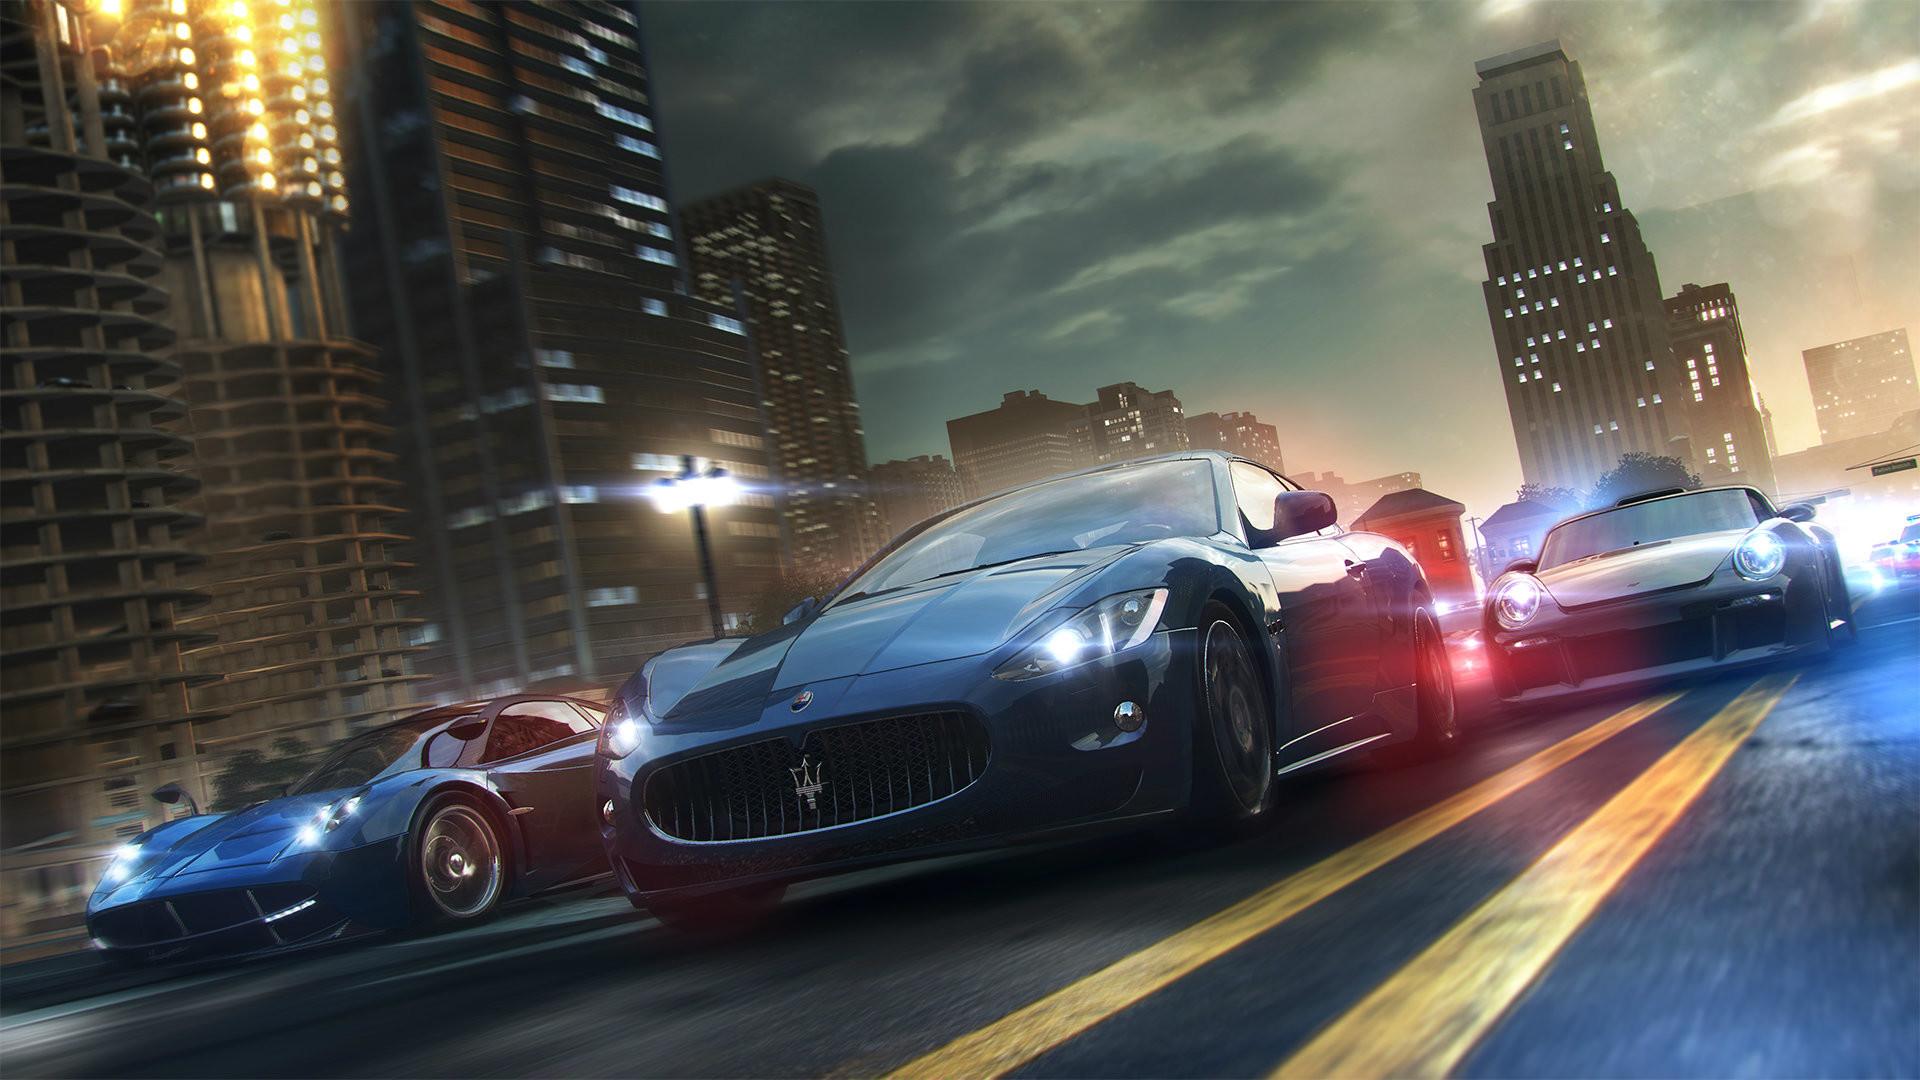 Car Racing Games HD Backgrounds